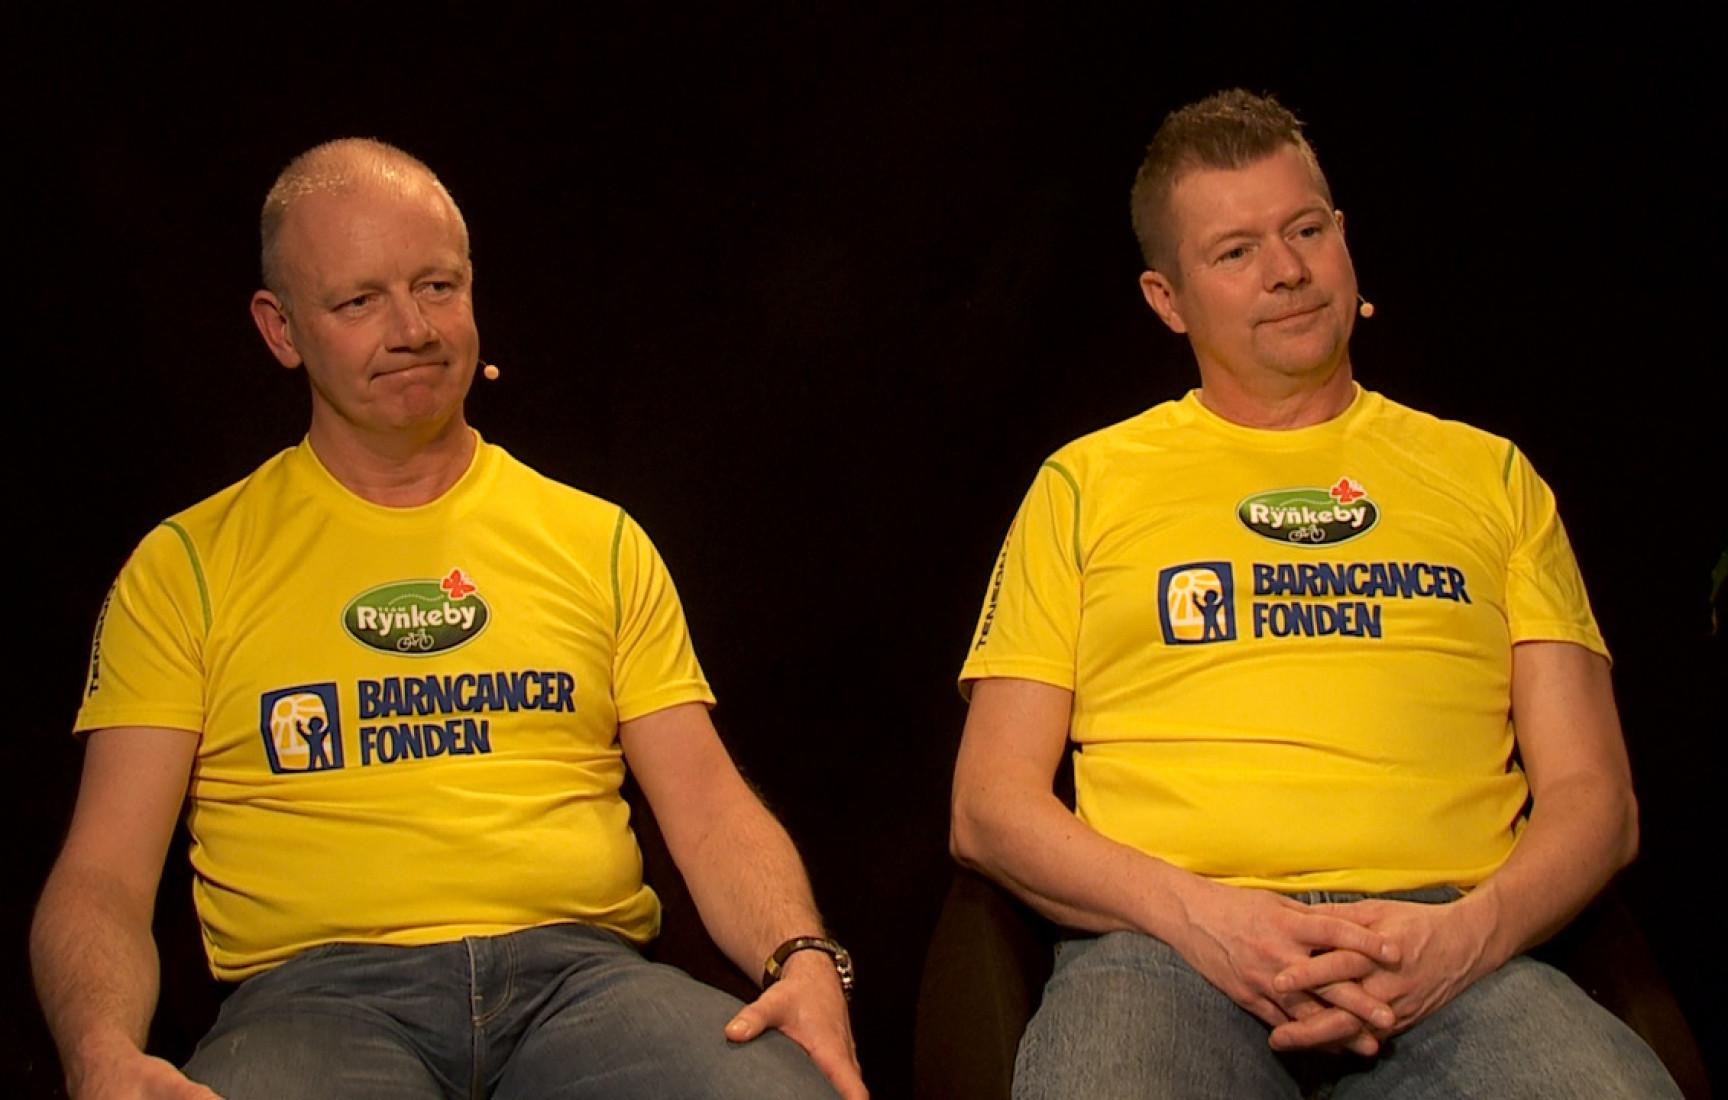 Glimt – Team Rynkeby och Reprostugan